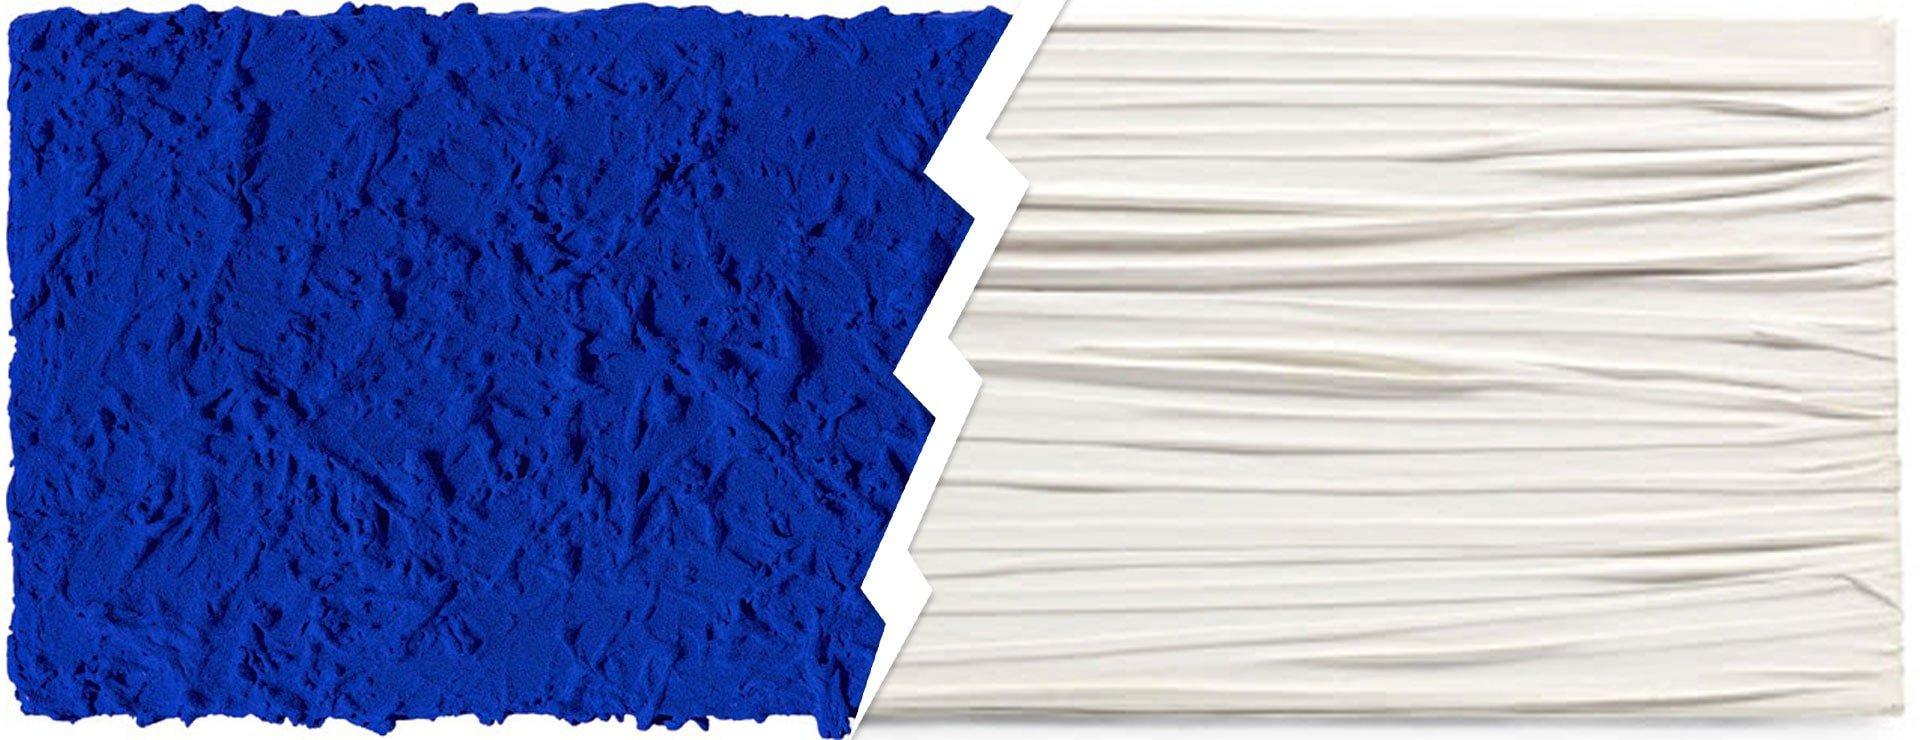 Monochrome di Yves Klein contro Achrome di Piero Manzoni